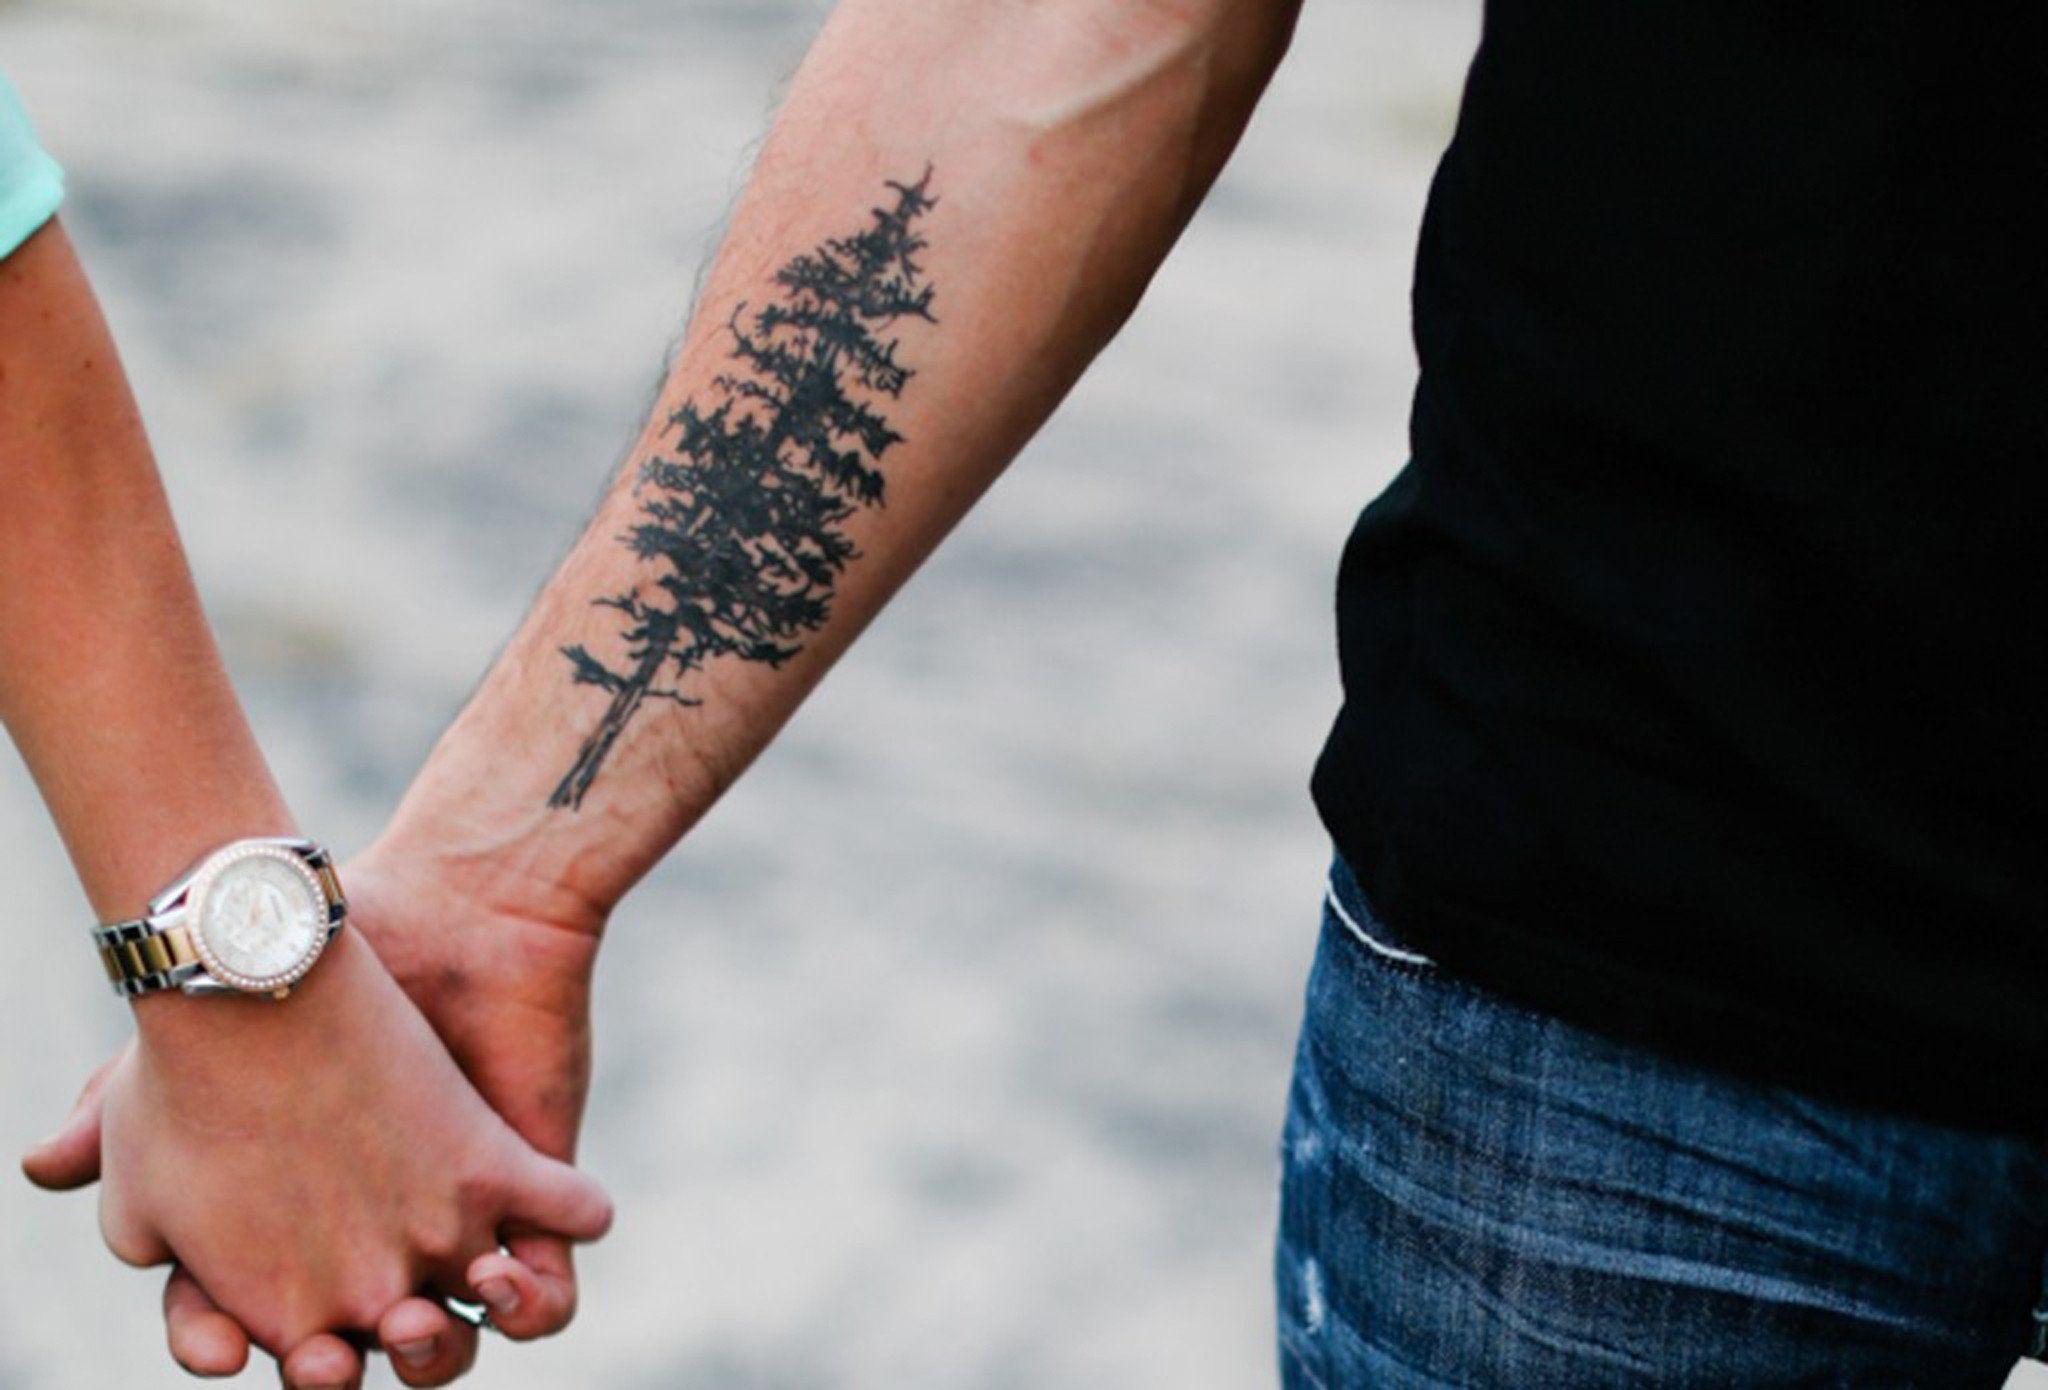 Evergreen Pine Tree Forearm Tattoo Ideas For Men Couple At Mybodiart Com Evergreen Tree Tattoo Tree Tattoo Men Tree Tattoo Forearm